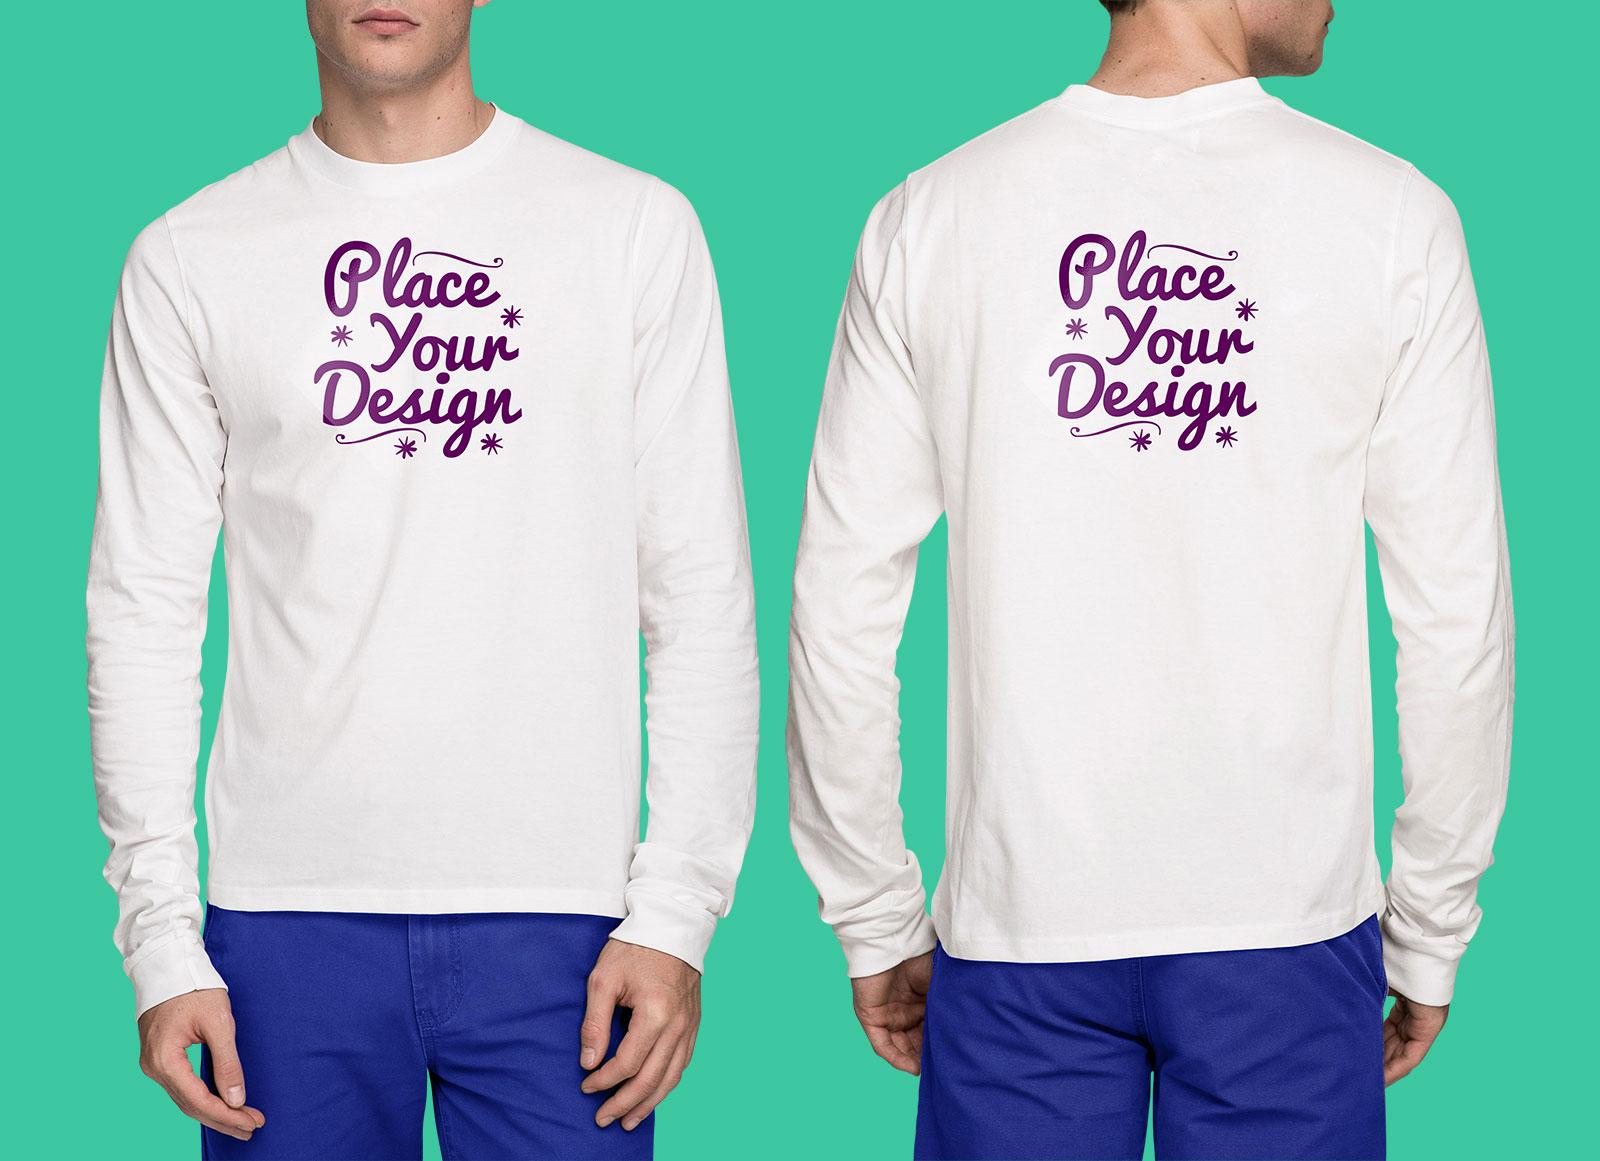 free front back white long sleeves t shirt mockup psd